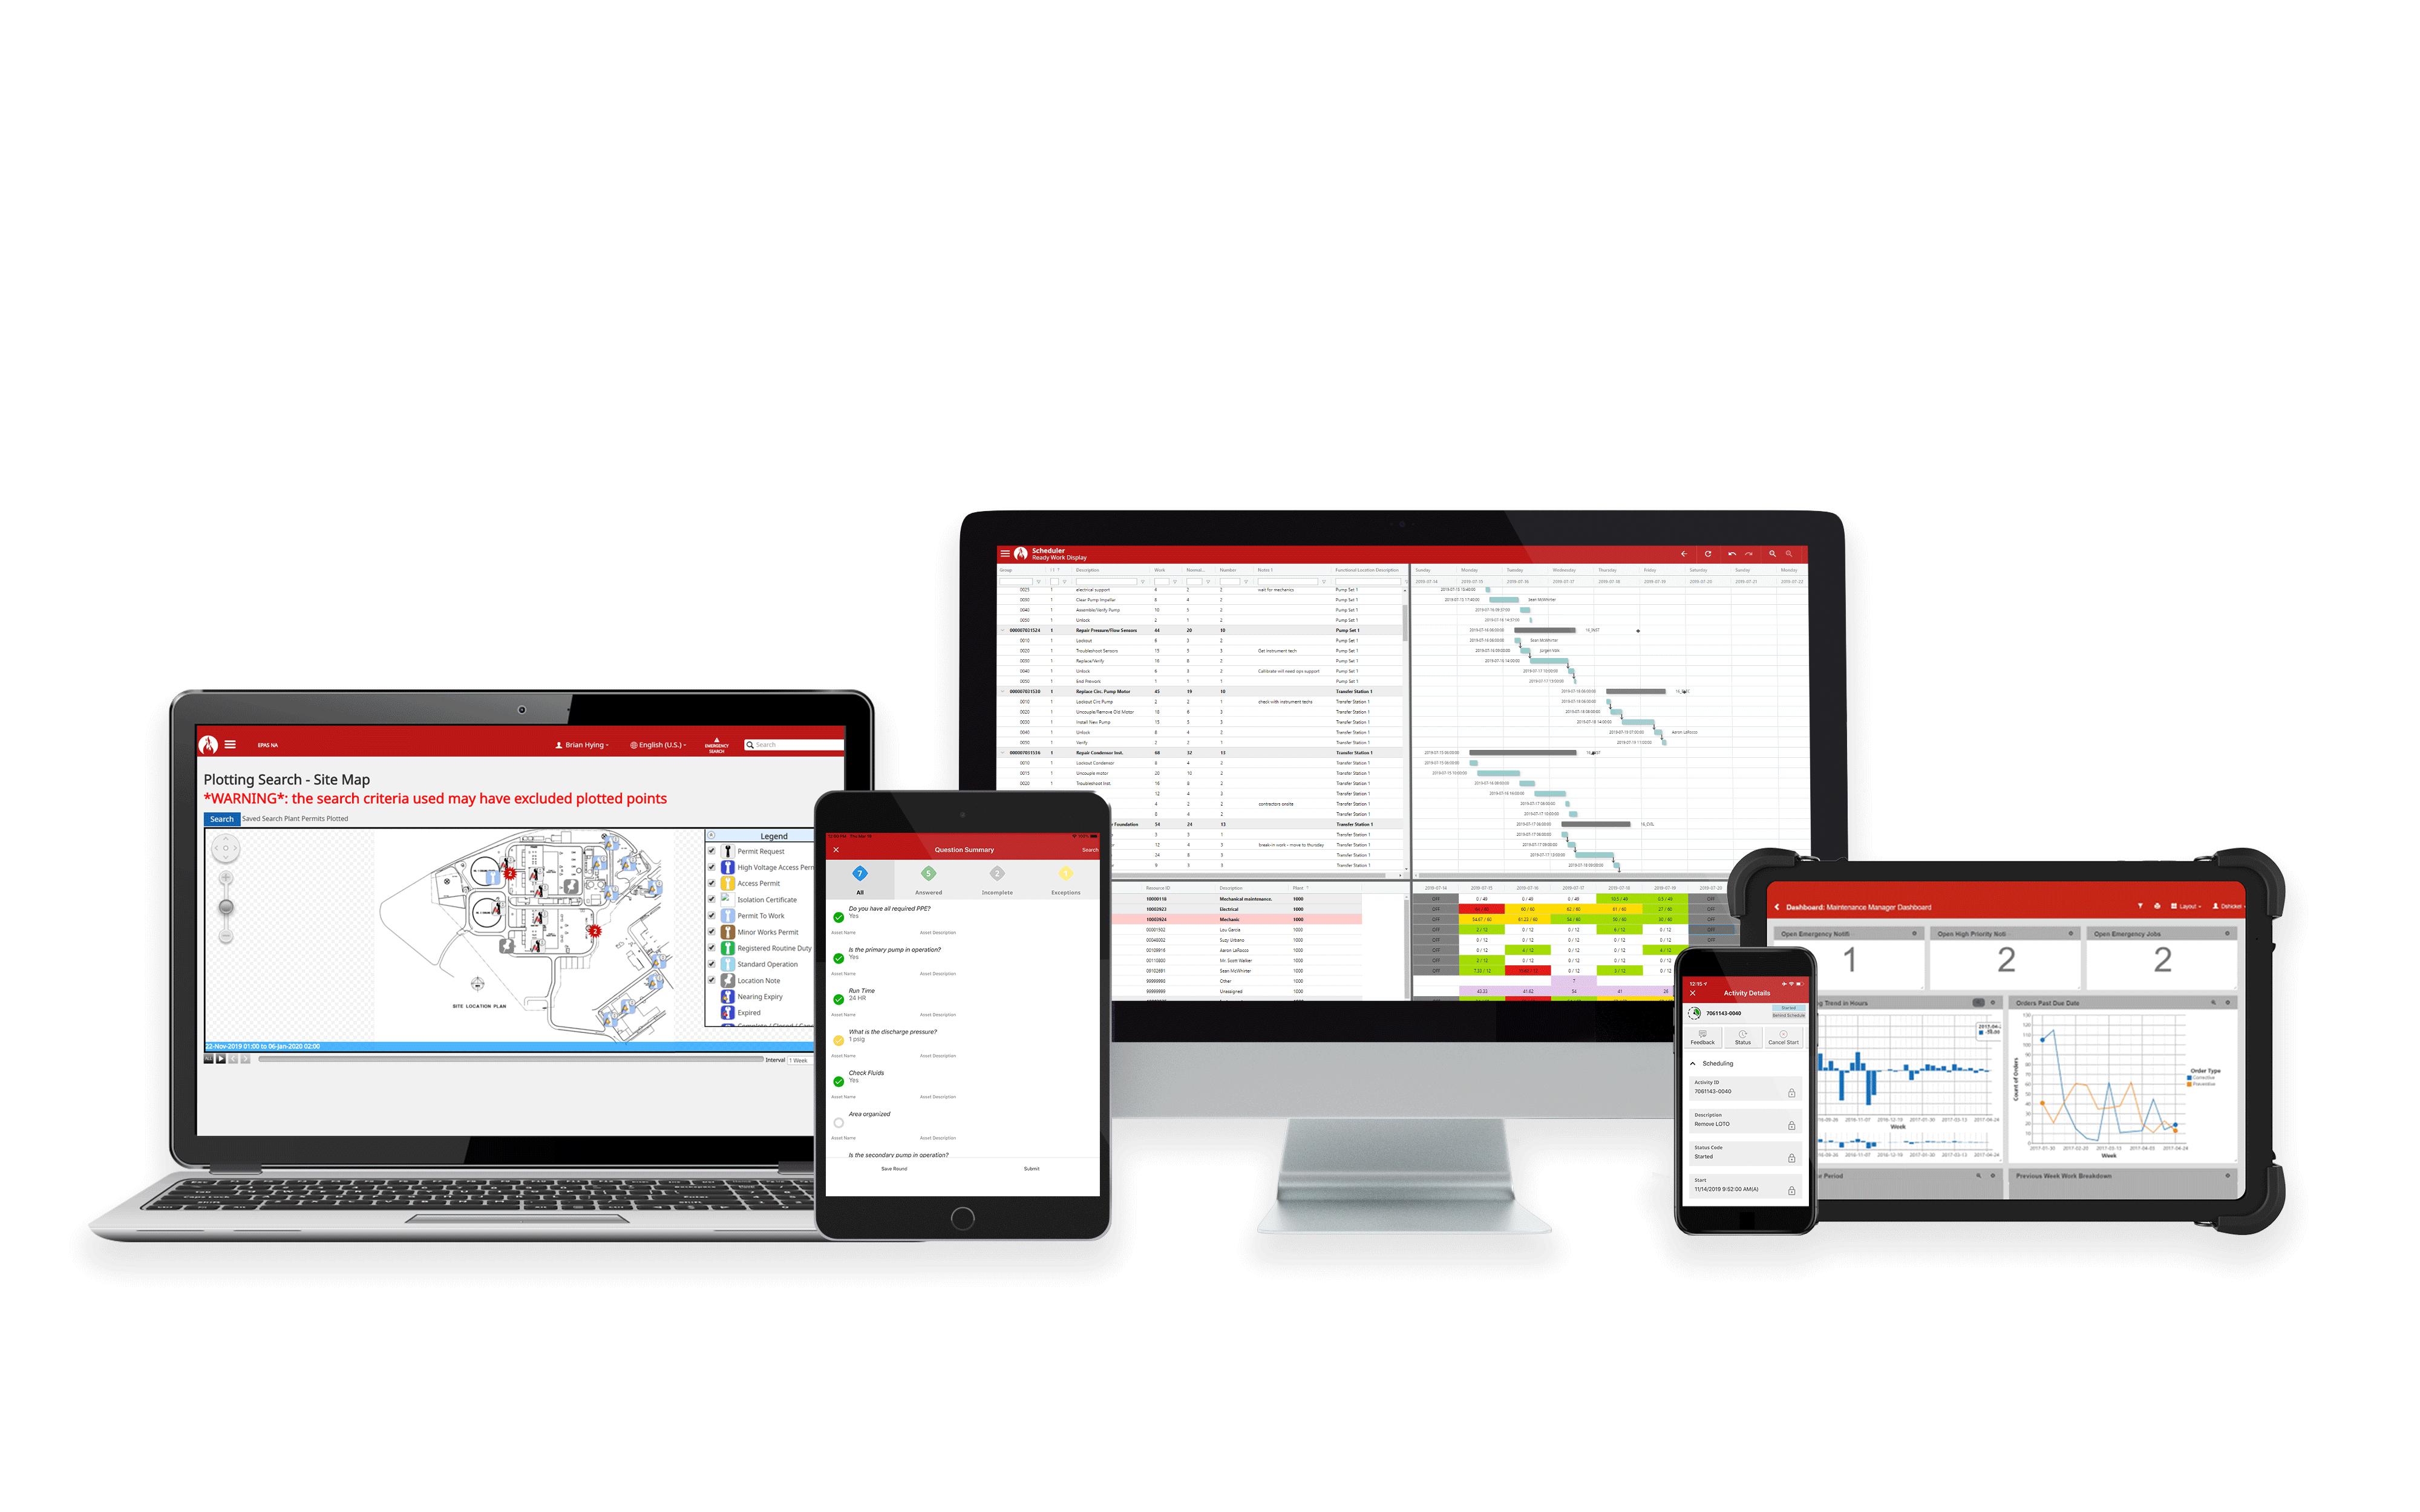 5 devices showcasing the Prometheus Platform software running on desktop, mobile, ipad, laptop, and ipad landscape